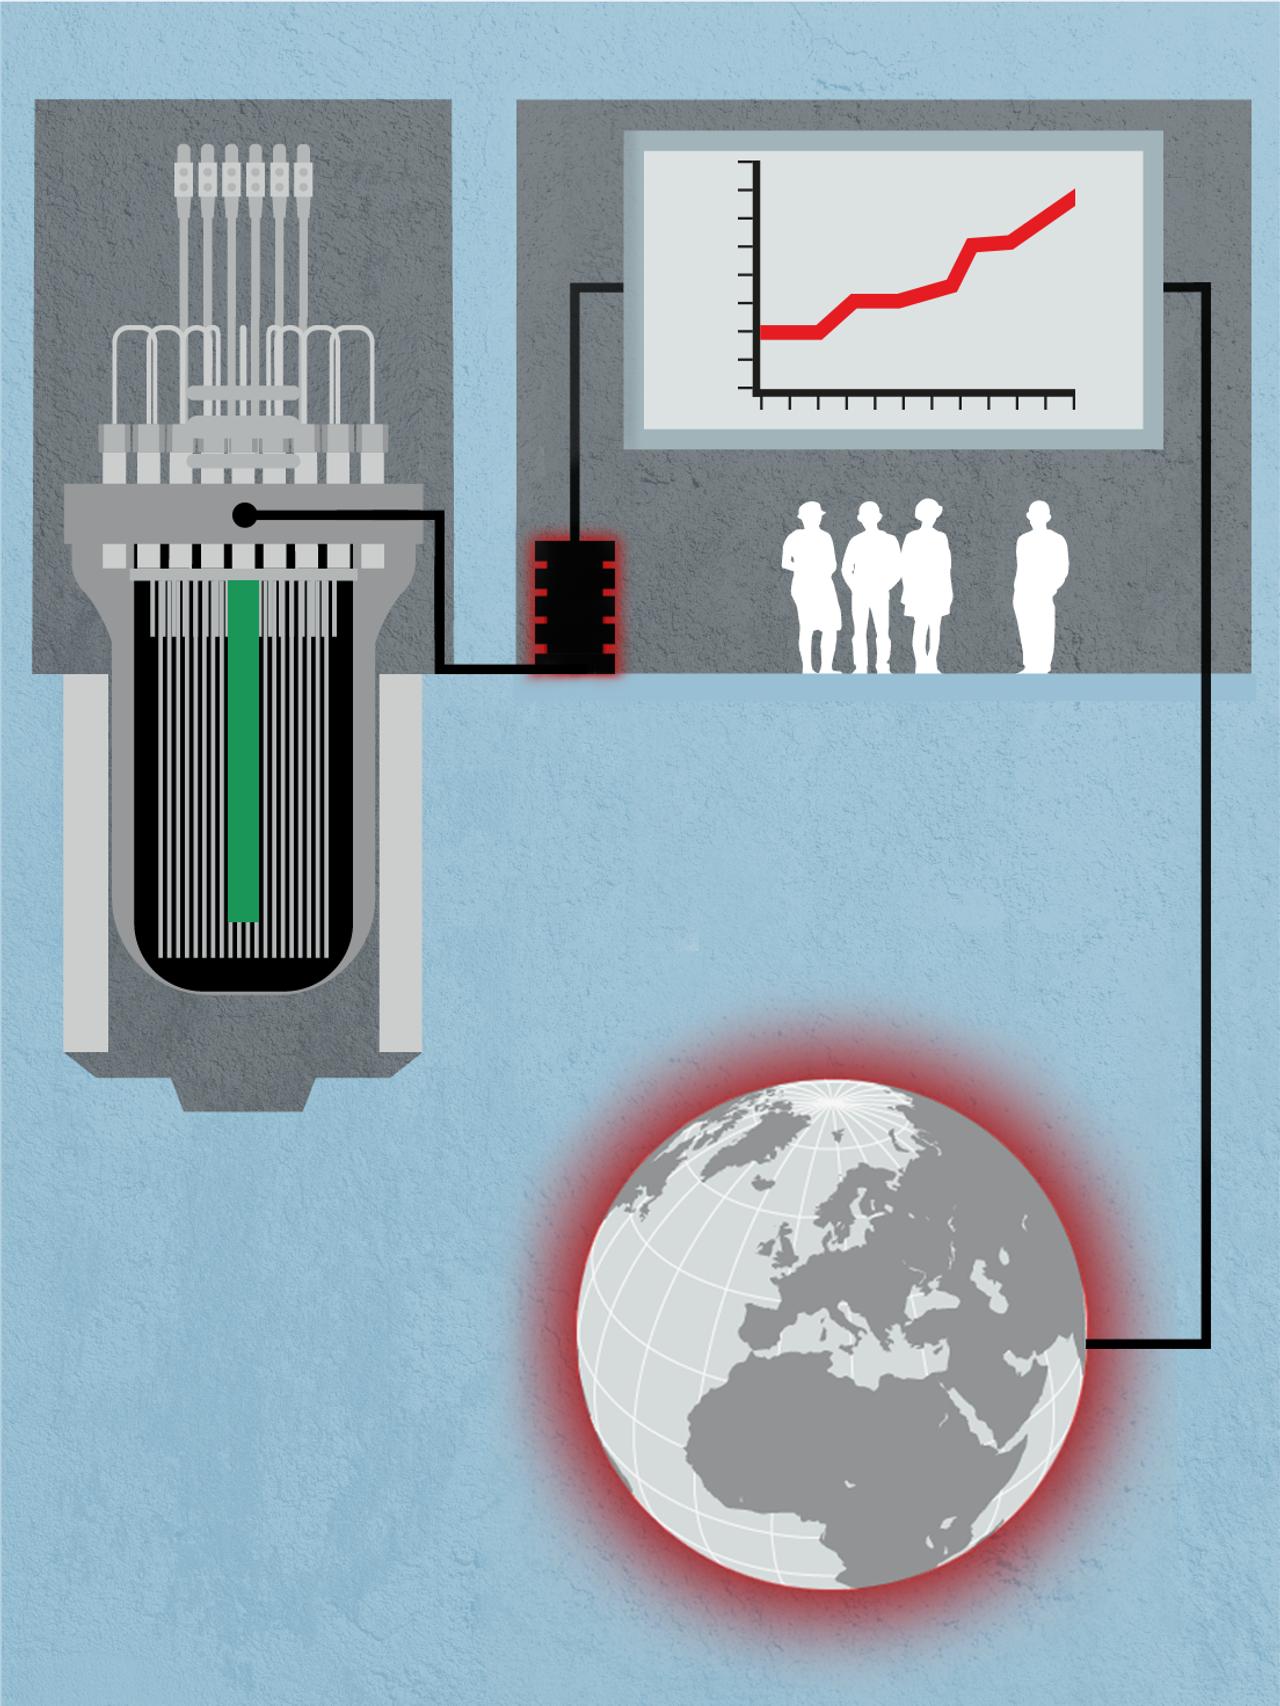 Atomreaktor illustrasjon del 4